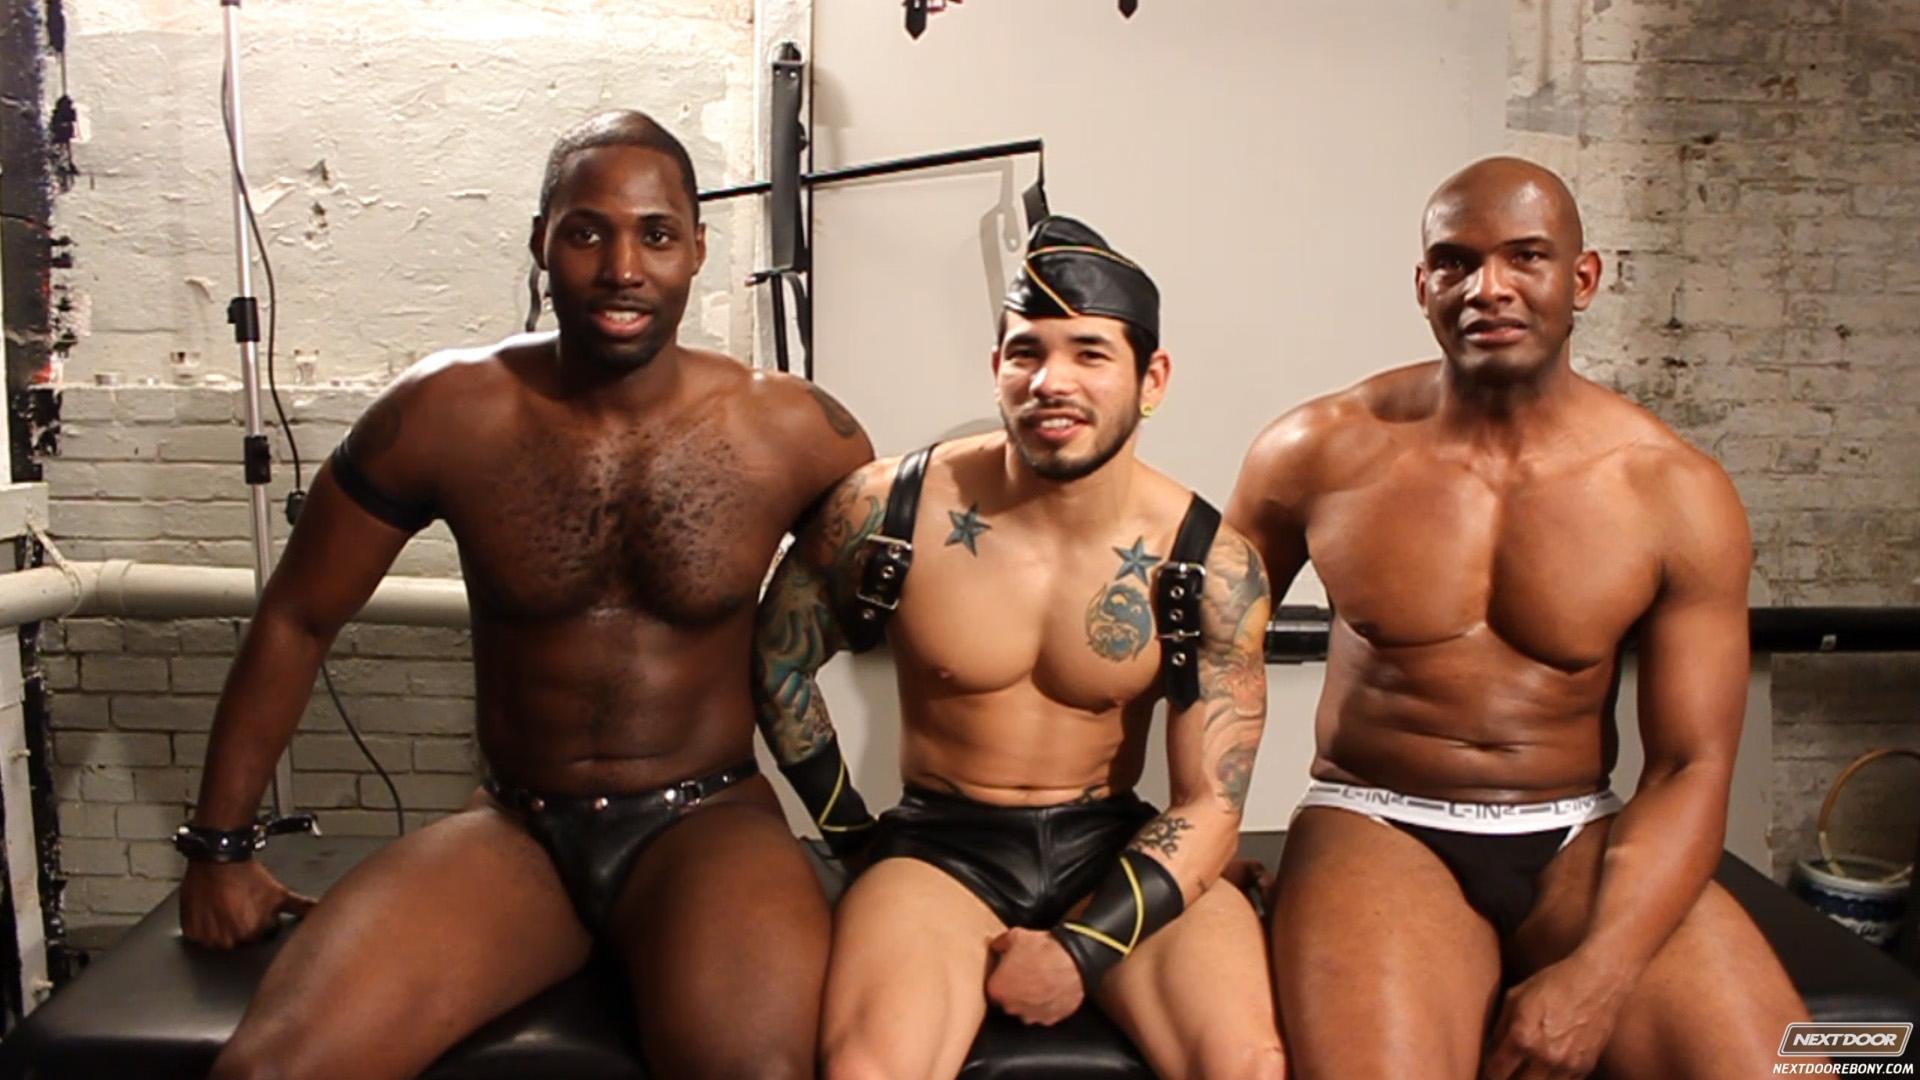 Leather Sex: Draven Torres, Montaz and Nubius